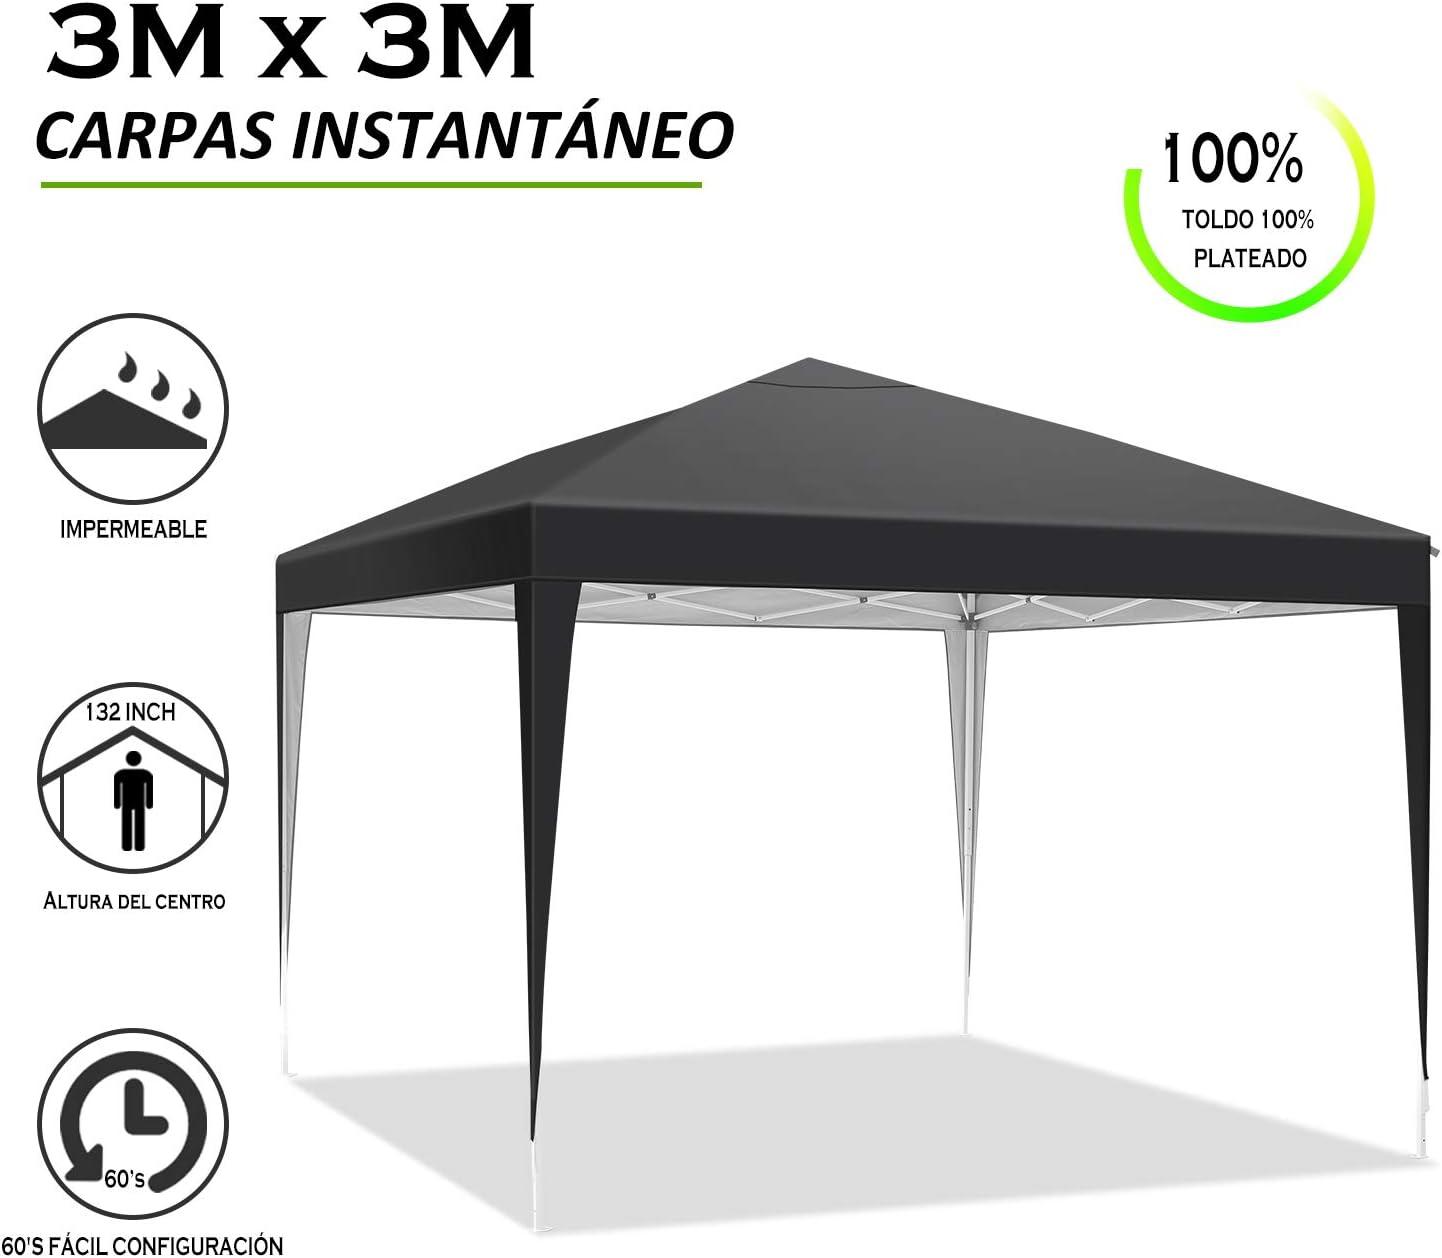 YUEBO Carpa 3x3 m Carpas Plegables Impermeables Gazebo Plegable Cenador Plegable Camping Cenadores para Jardin, Fiestas: Amazon.es: Jardín